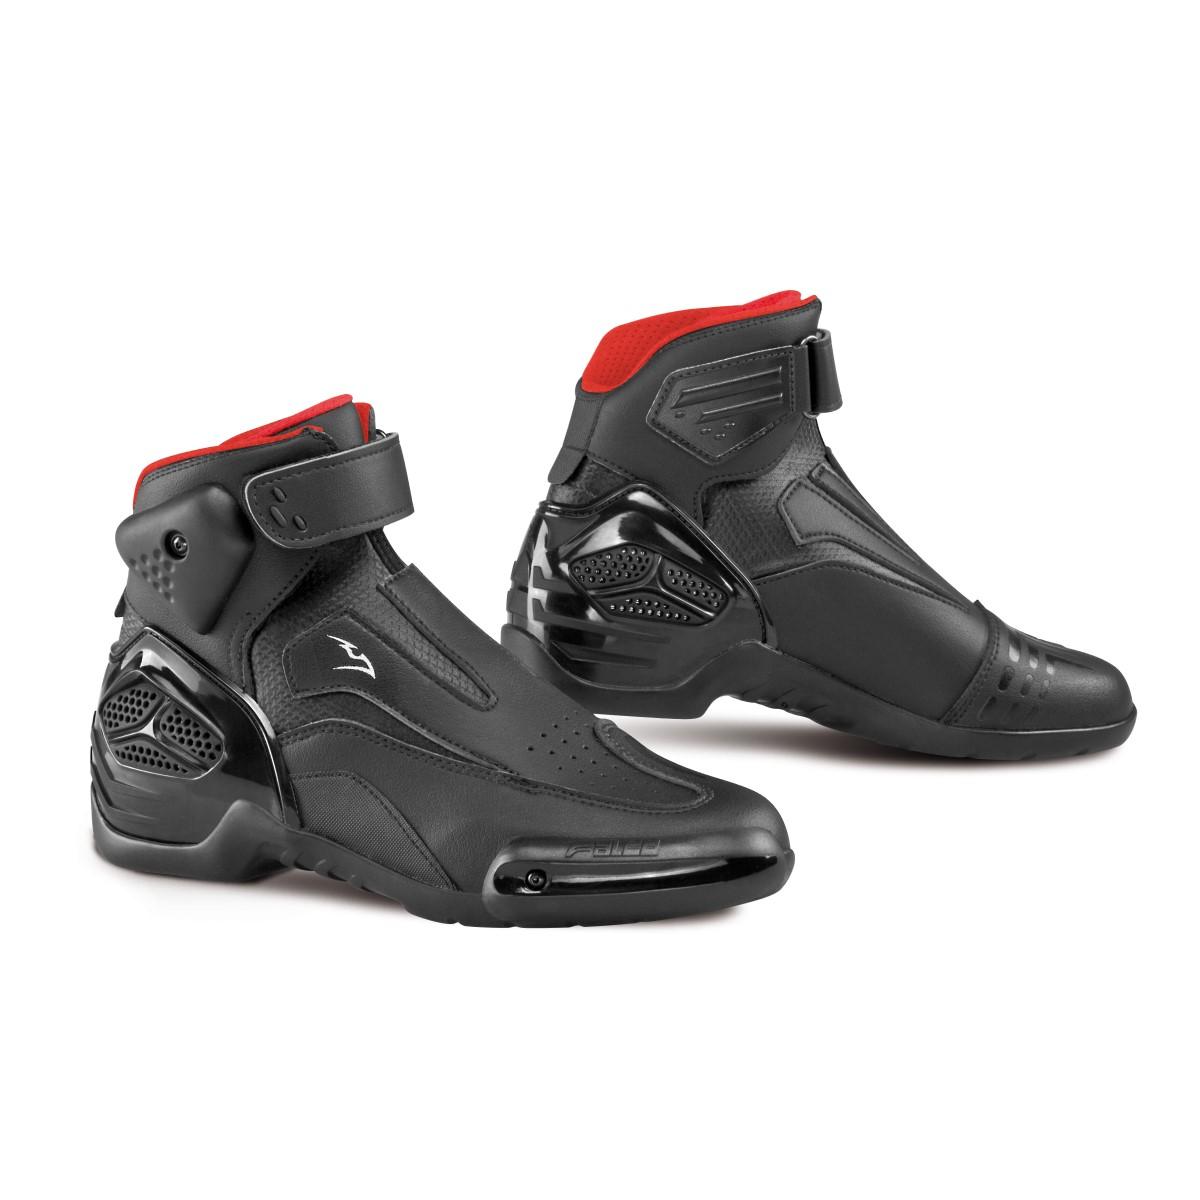 NOVO 2 Urban Sport Boots